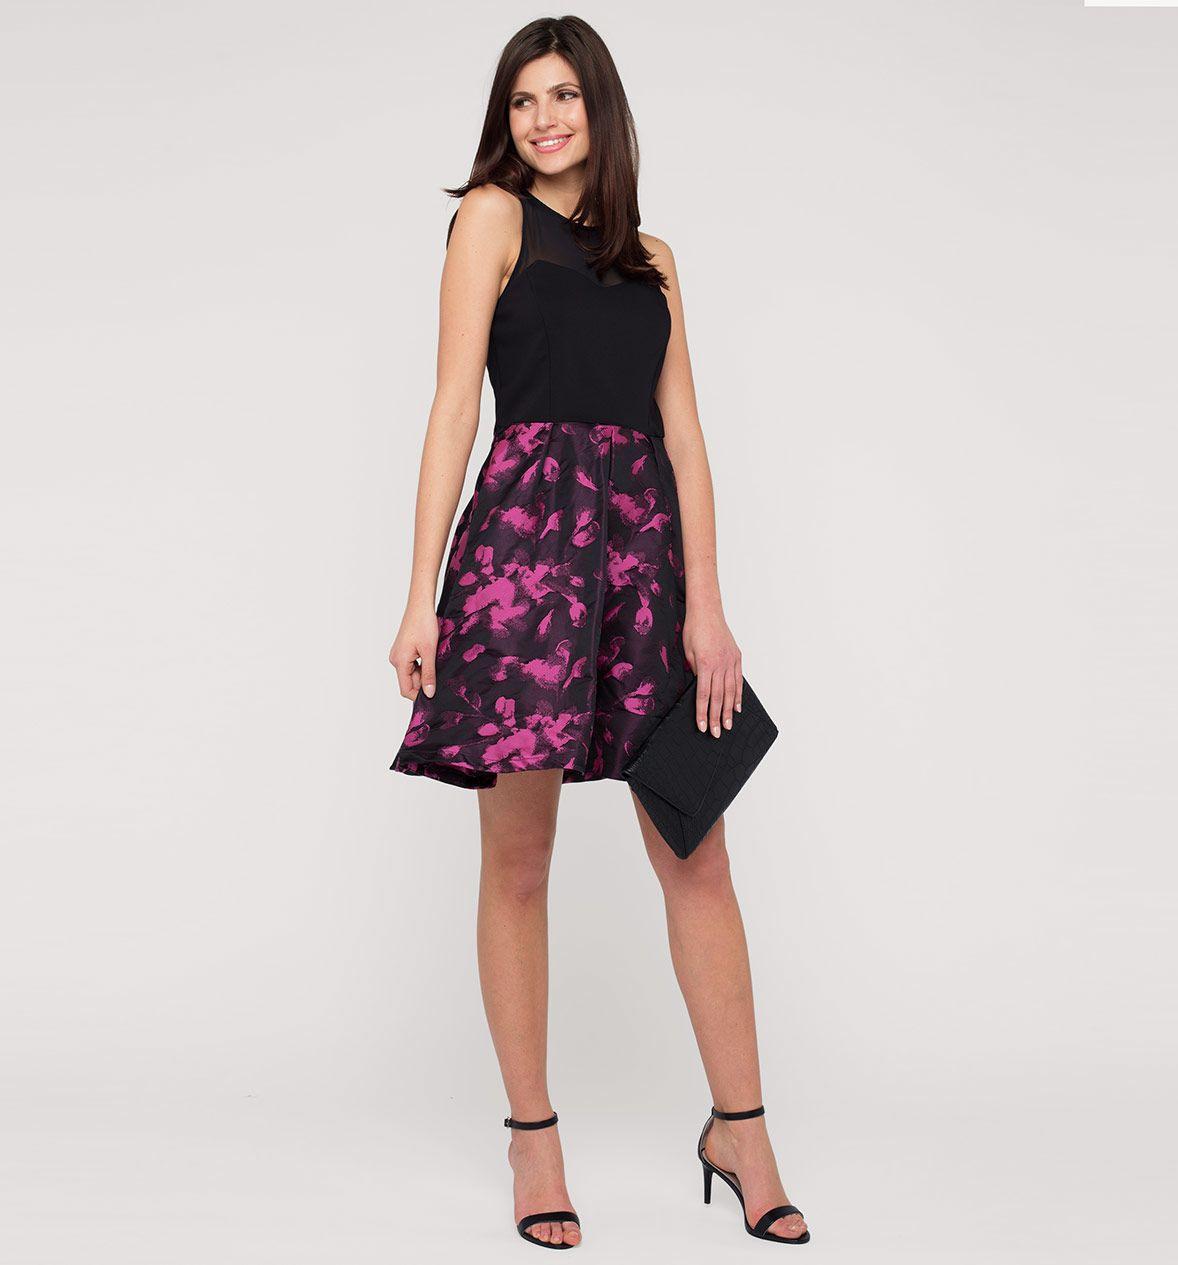 17 Elegant Abendkleid C&A Vertrieb17 Elegant Abendkleid C&A Spezialgebiet